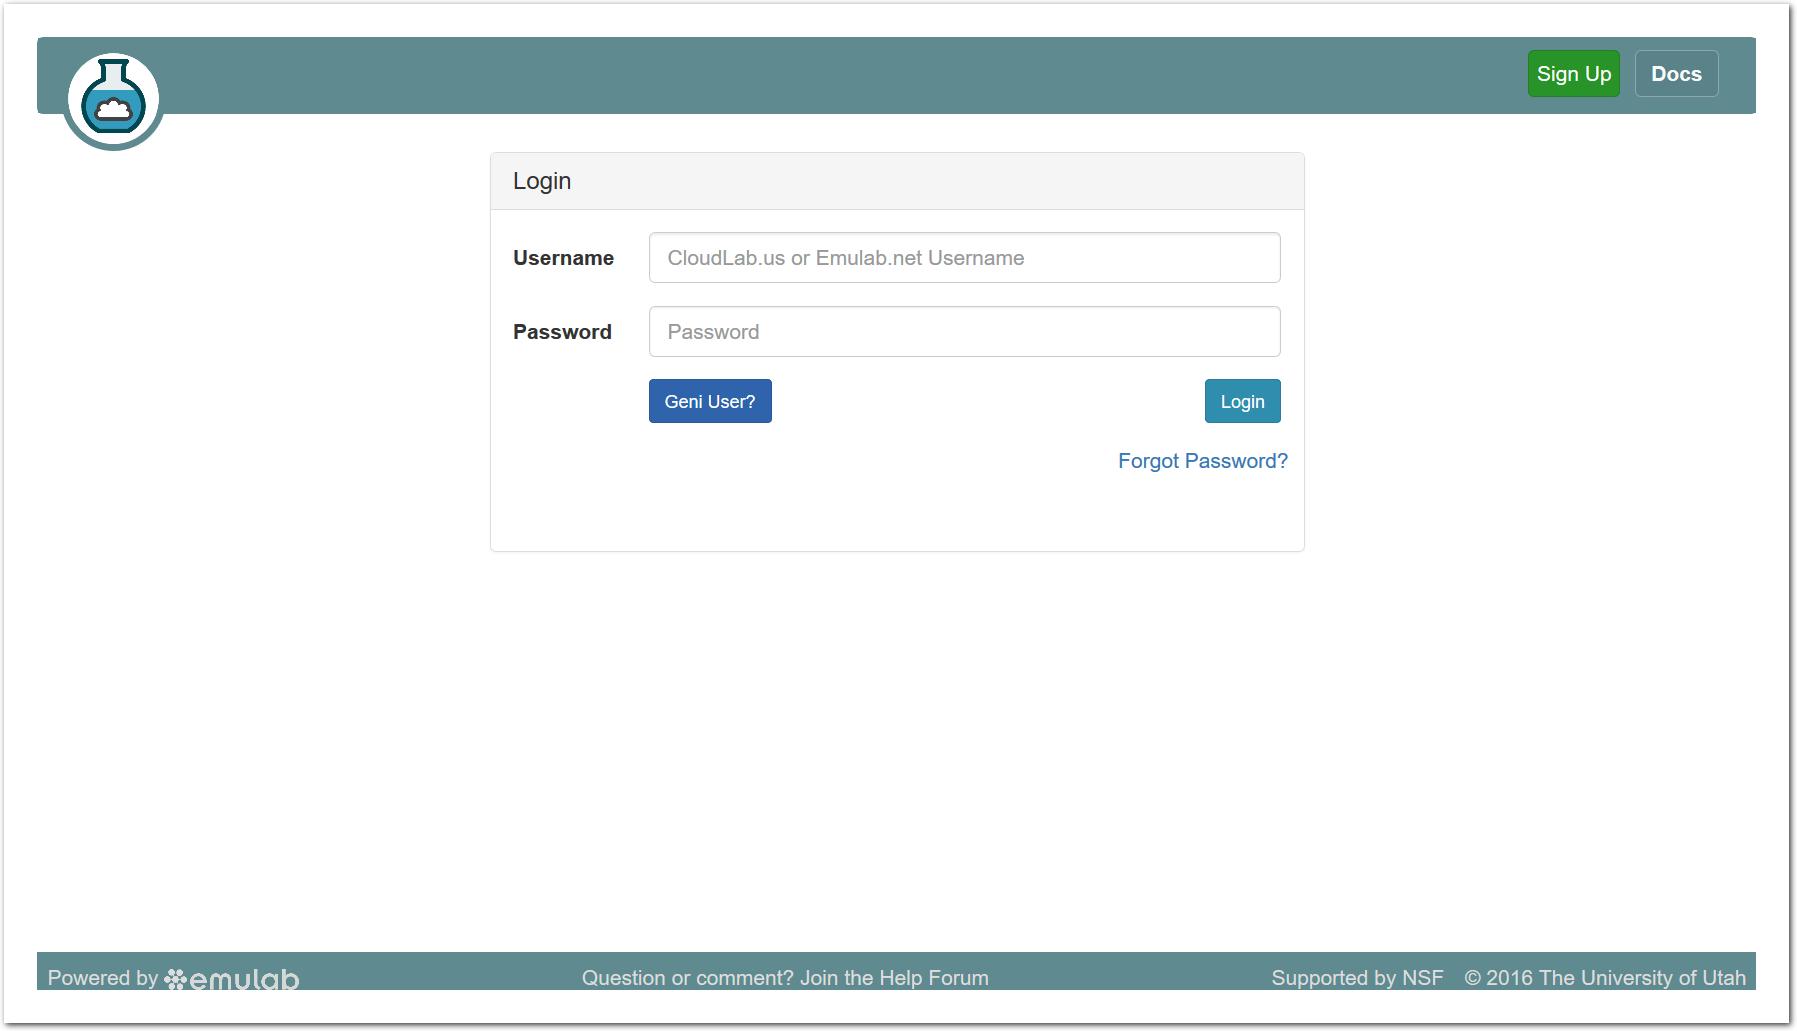 screenshots/clab/log-in.png